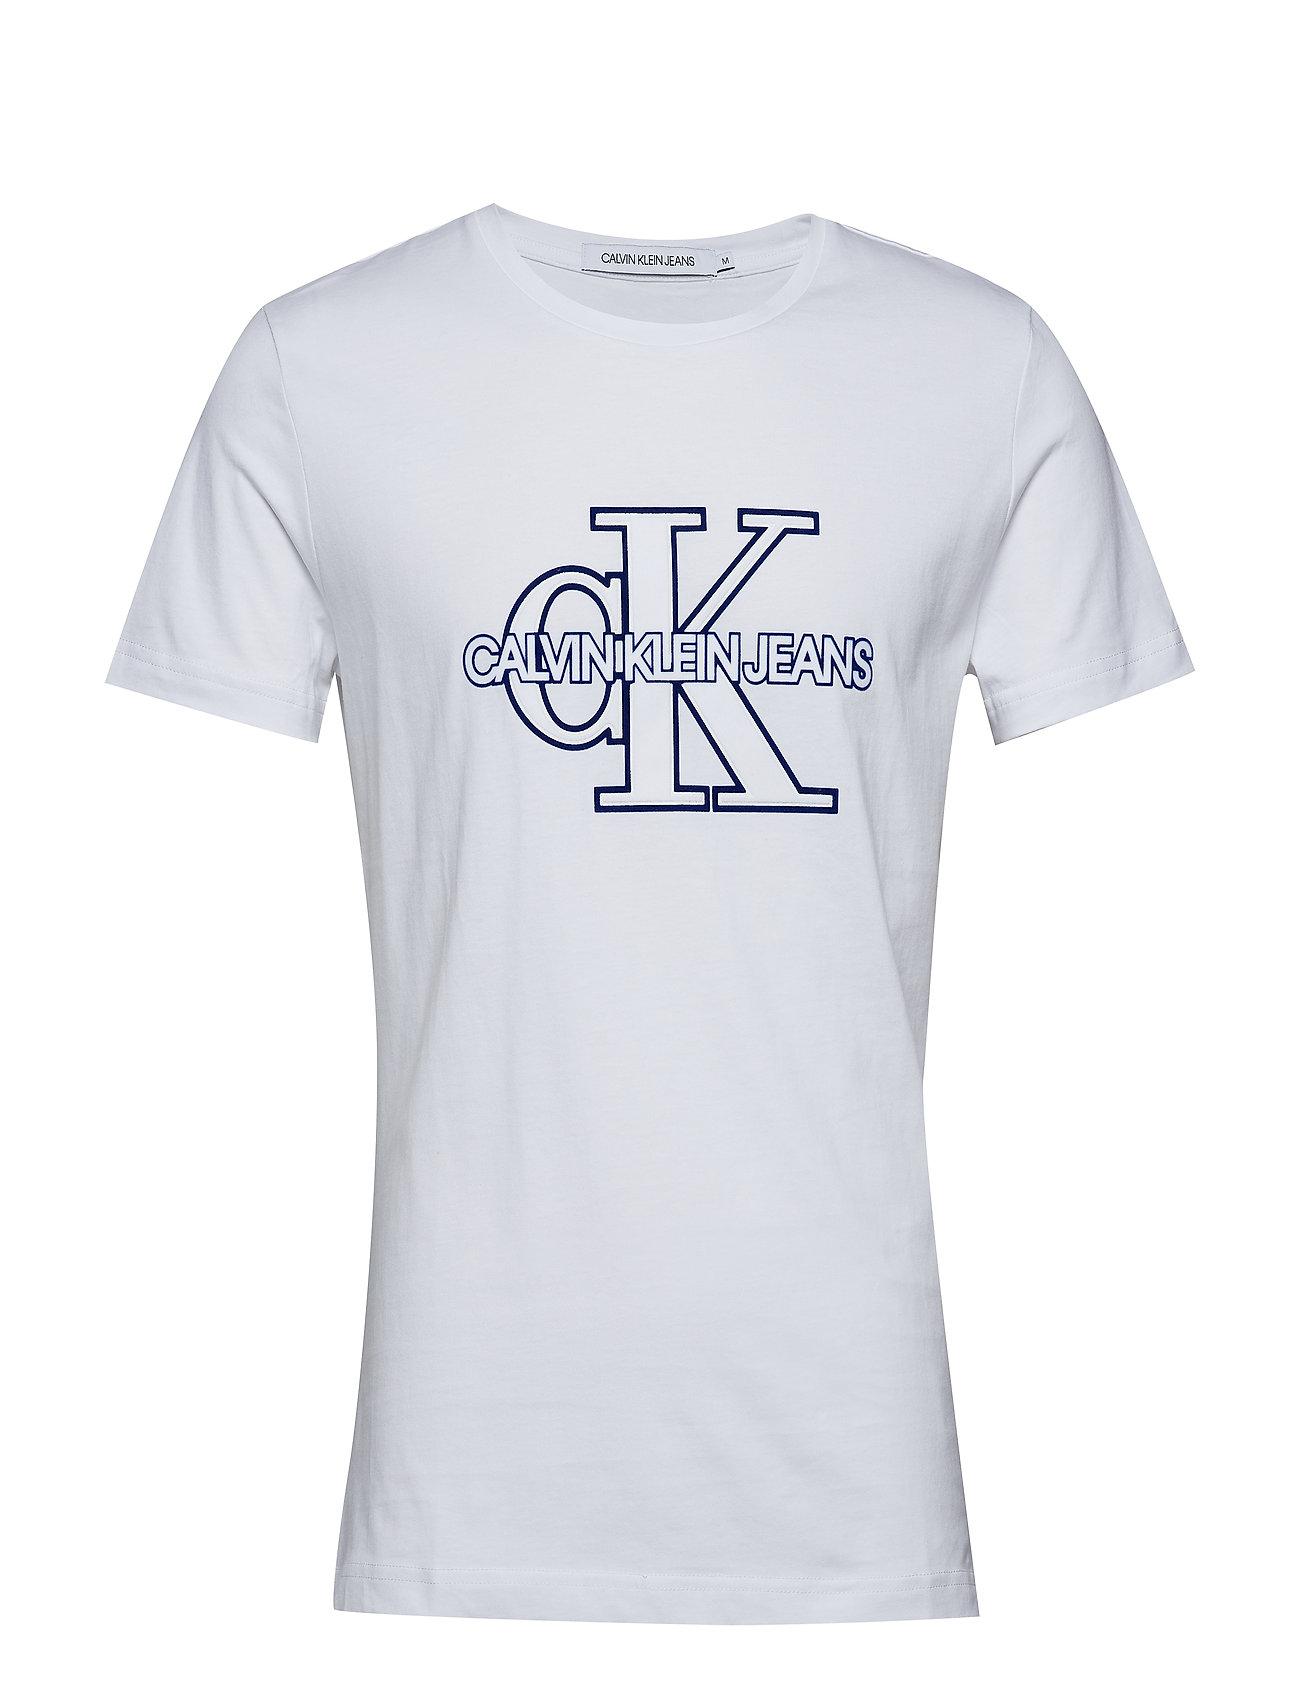 Calvin Klein Jeans CK MONOGRAM FRONT LOGO SLIM SS - BRIGHT WHITE / SURF THE WEB